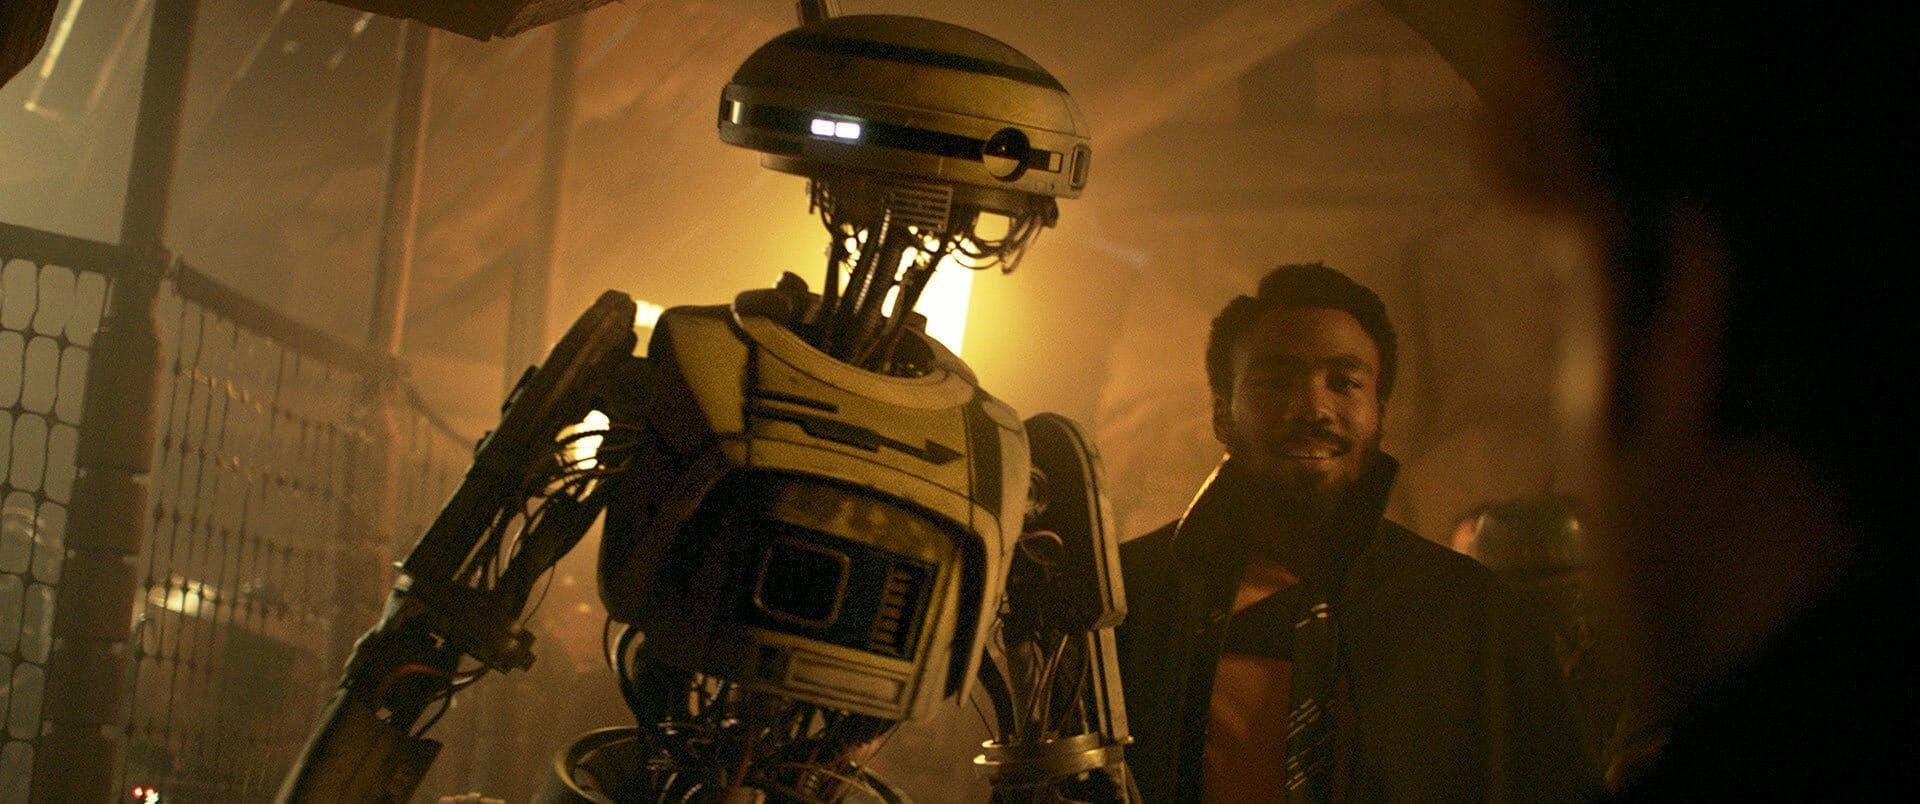 solo l337 droid